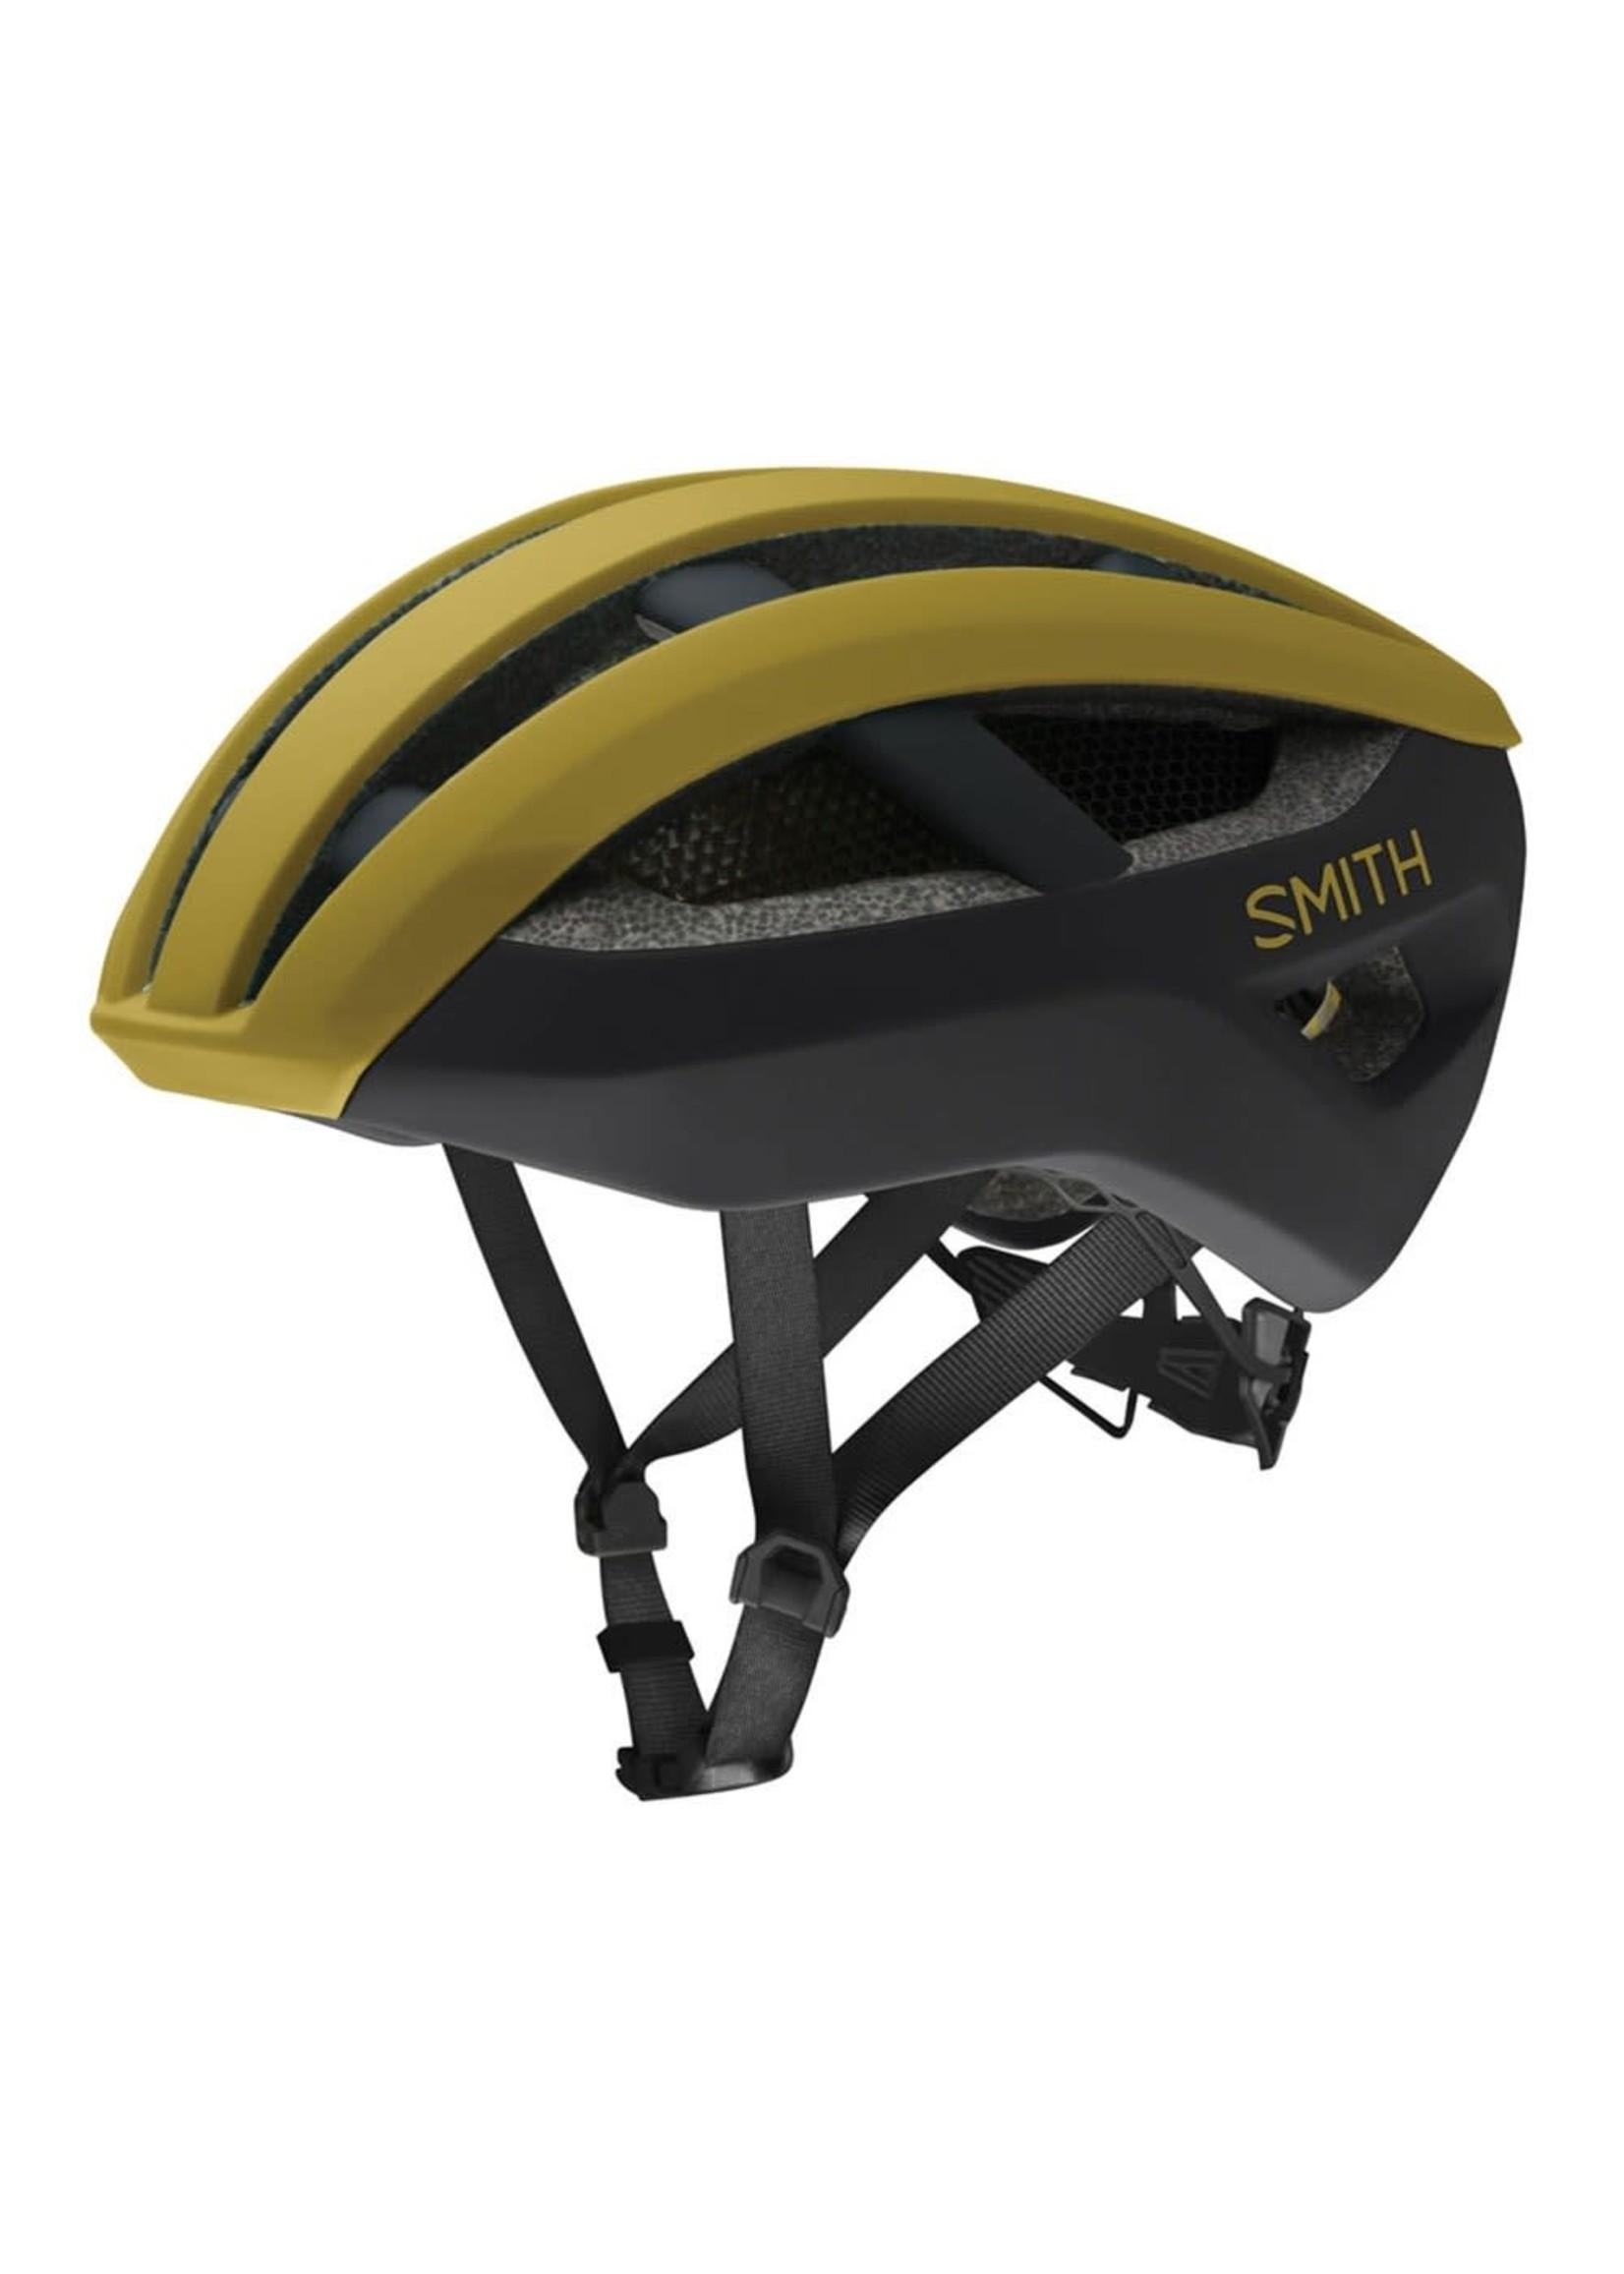 Smith Optics SMITH- NETWORK MIPS MYST GR 59-62